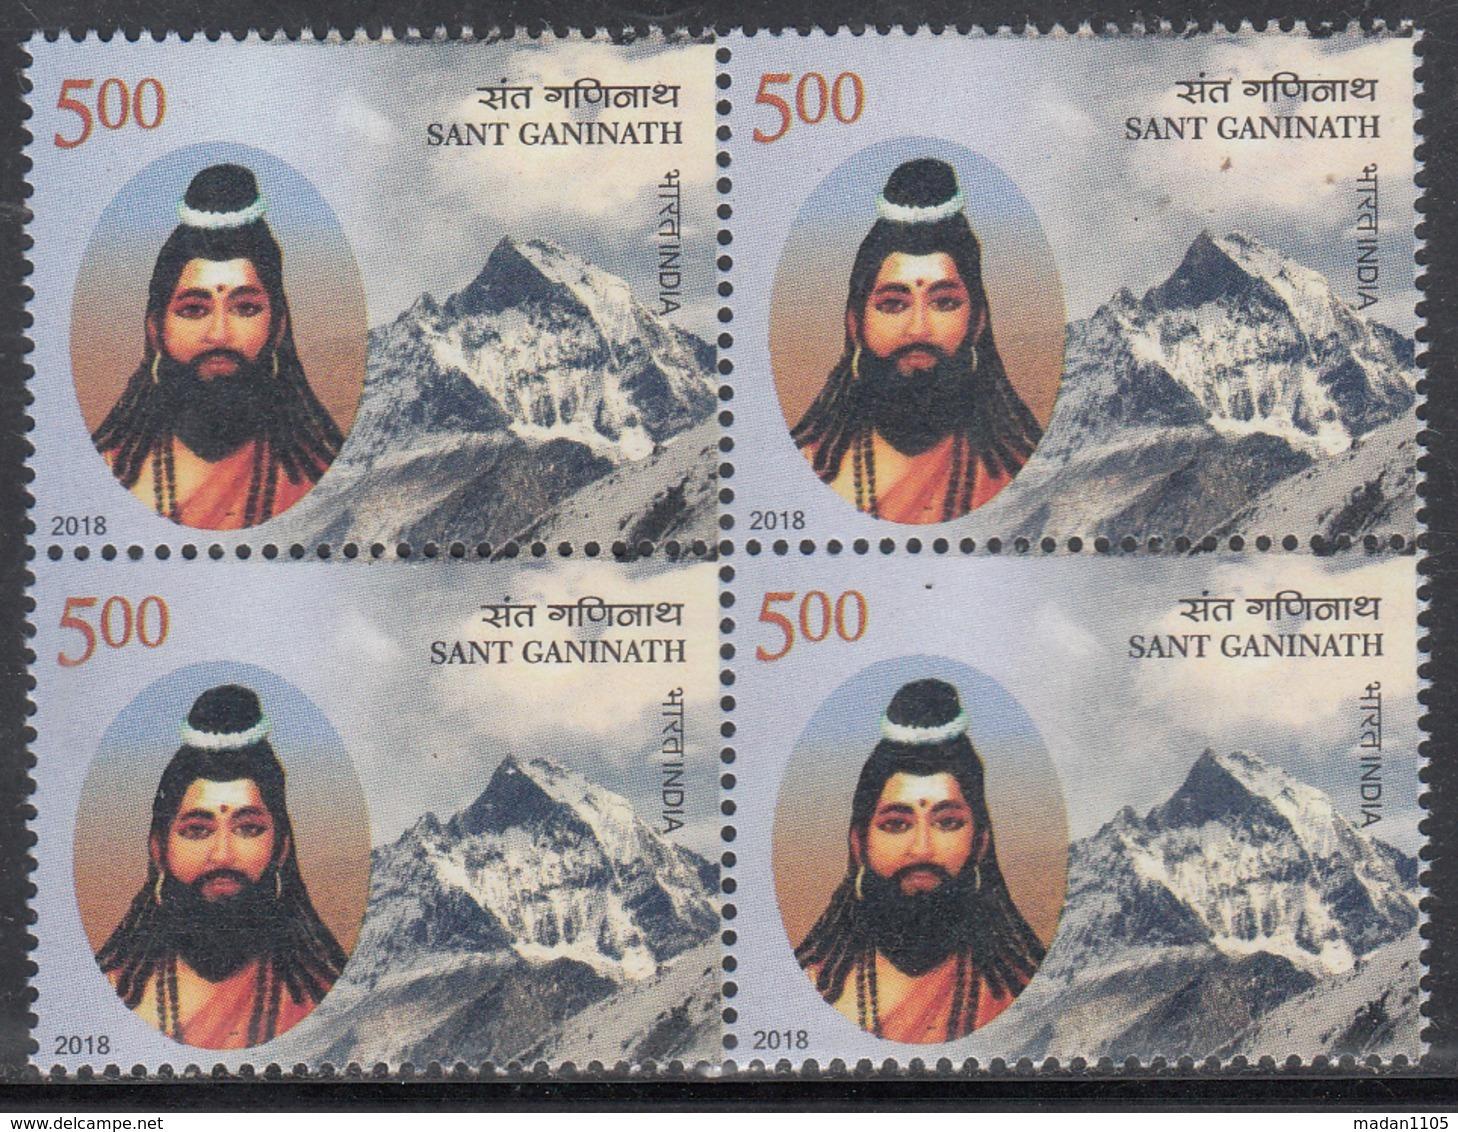 INDIA 2018 INDIA, MNH Sant GANINATH, Saint, Religion, Mountain, Block Of 4, MNH(**) - India